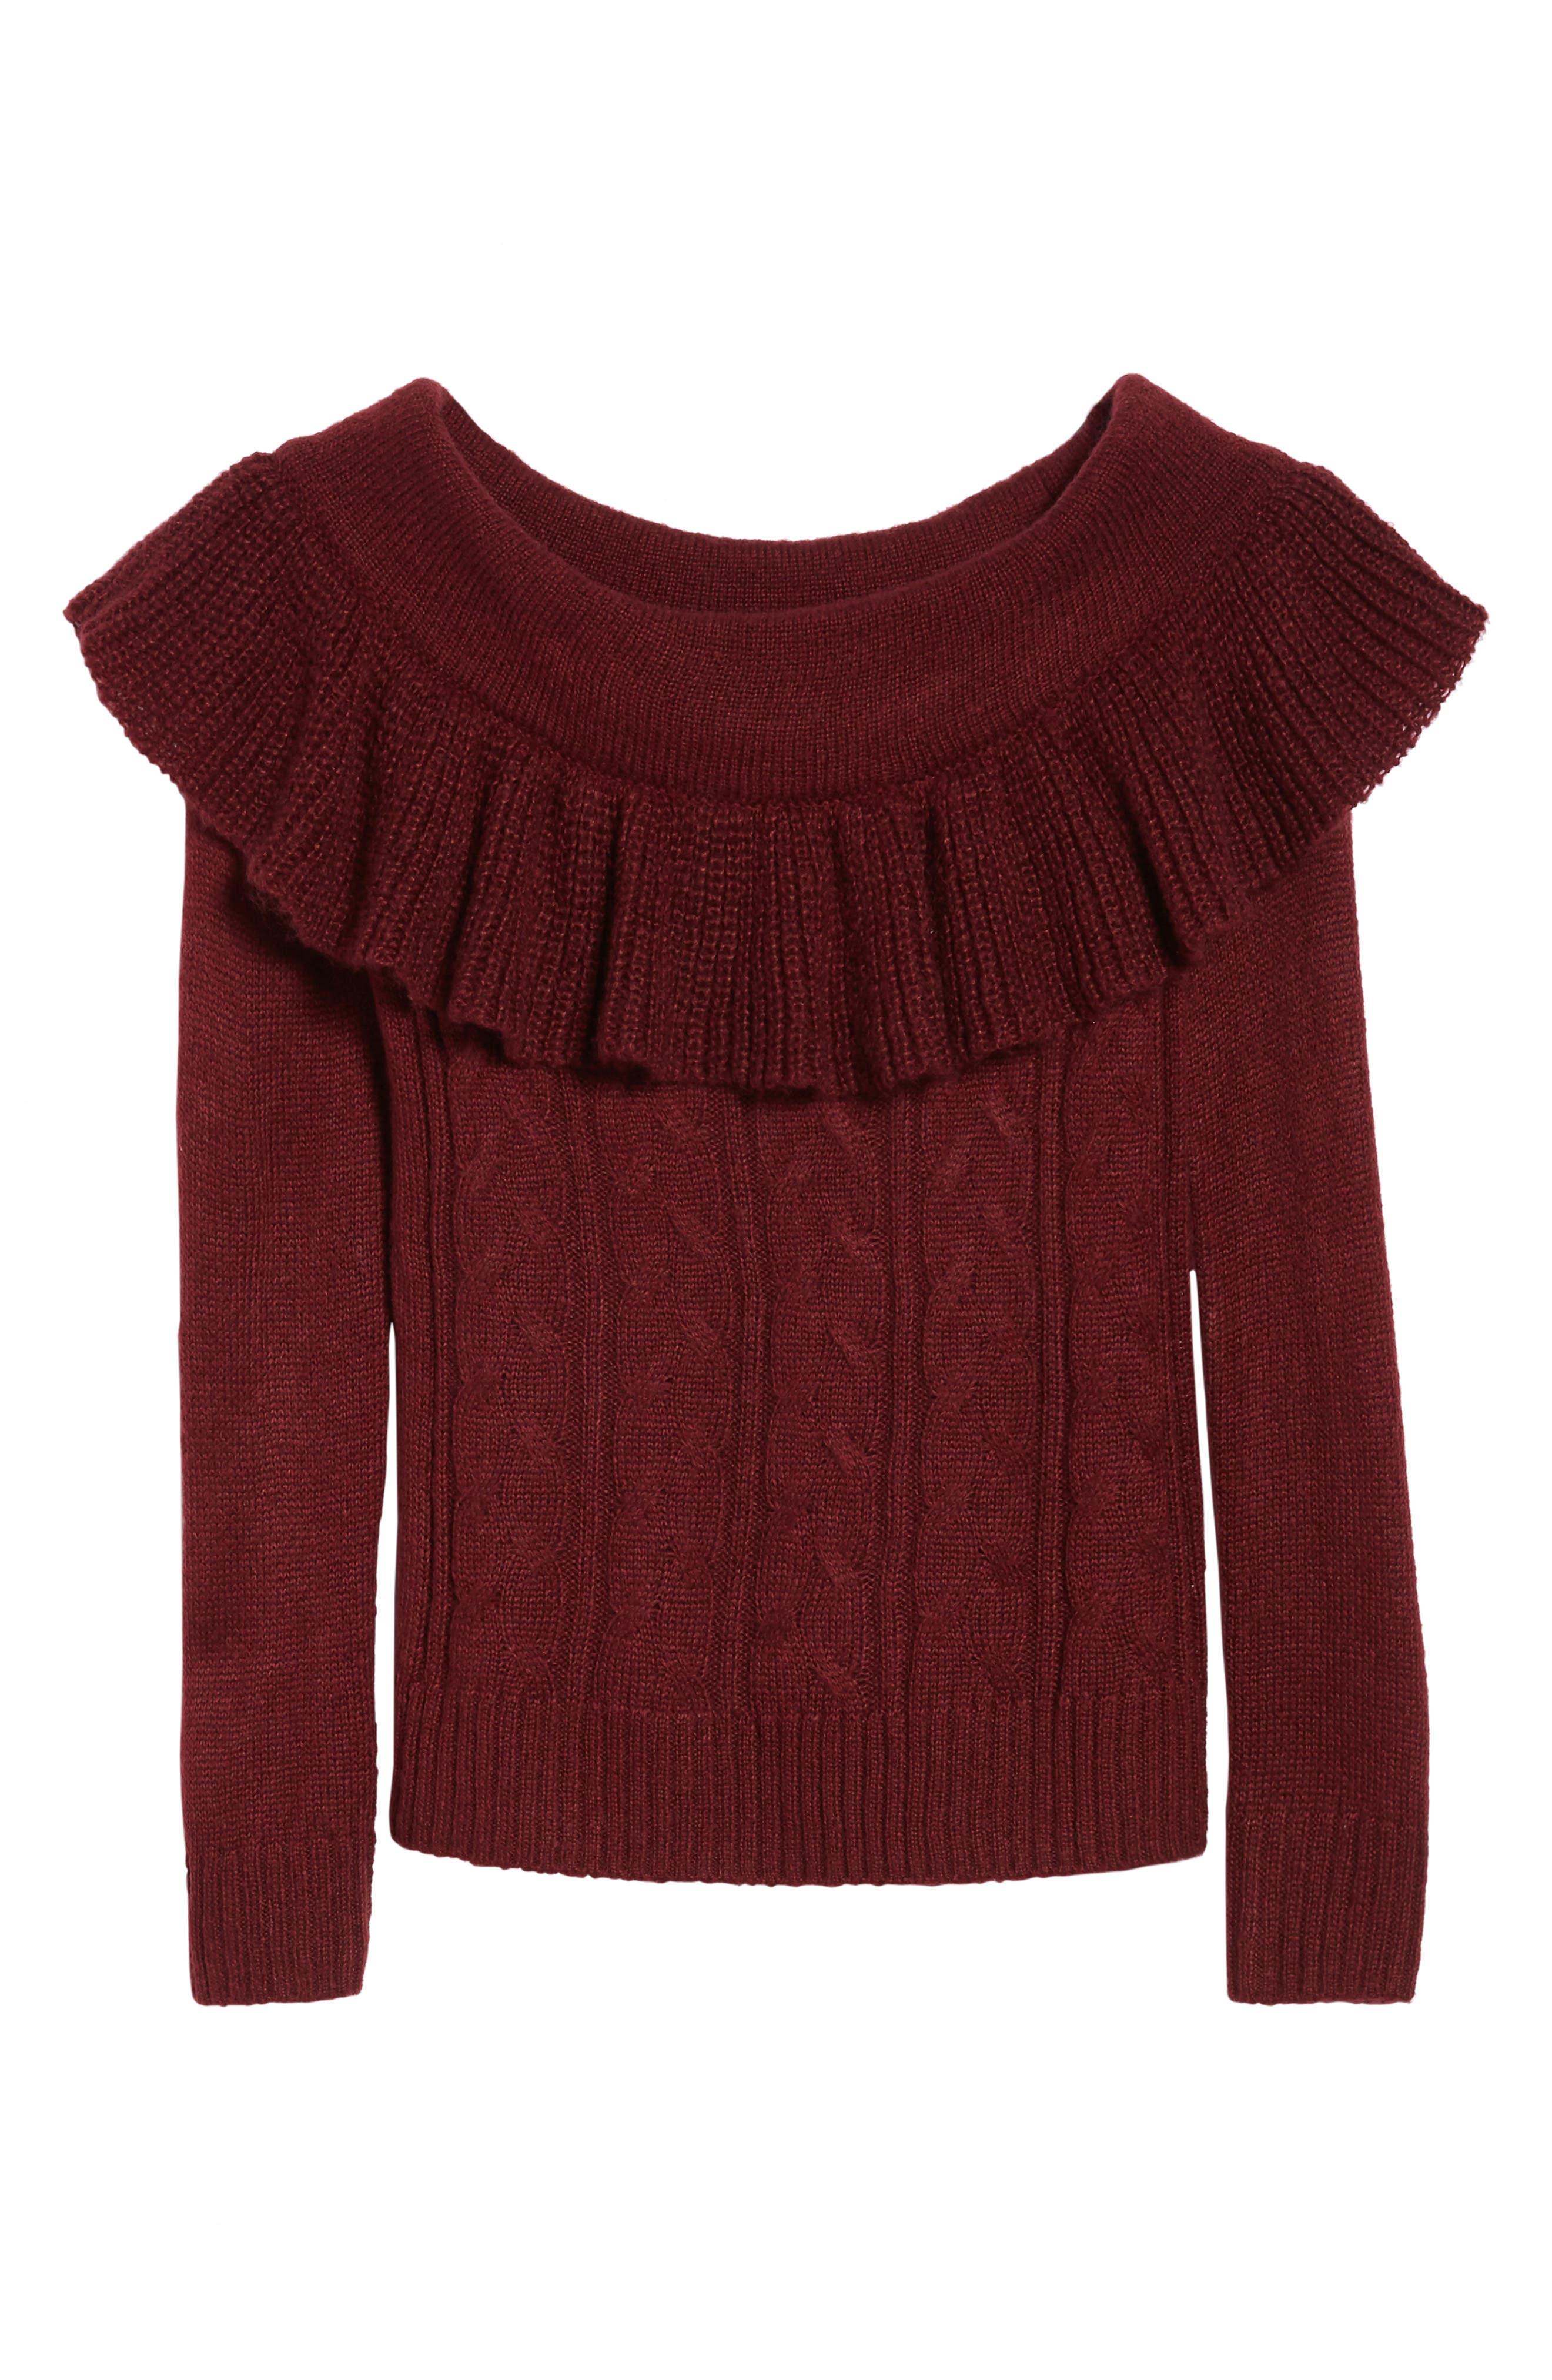 Sheldon Off the Shoulder Sweater,                             Alternate thumbnail 6, color,                             Red Tannin